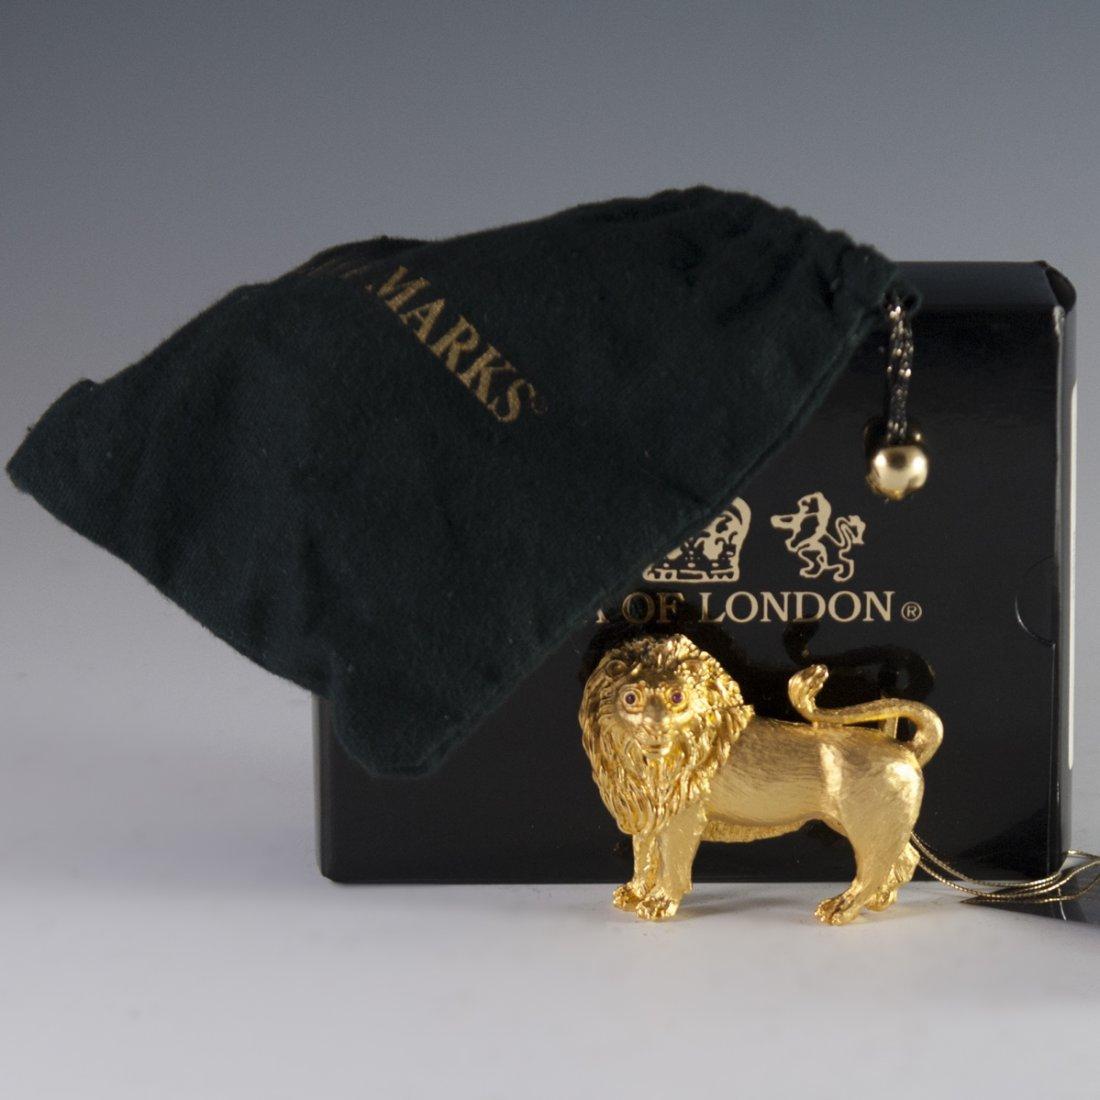 Lana of London Gilded Sterling Belt Buckle